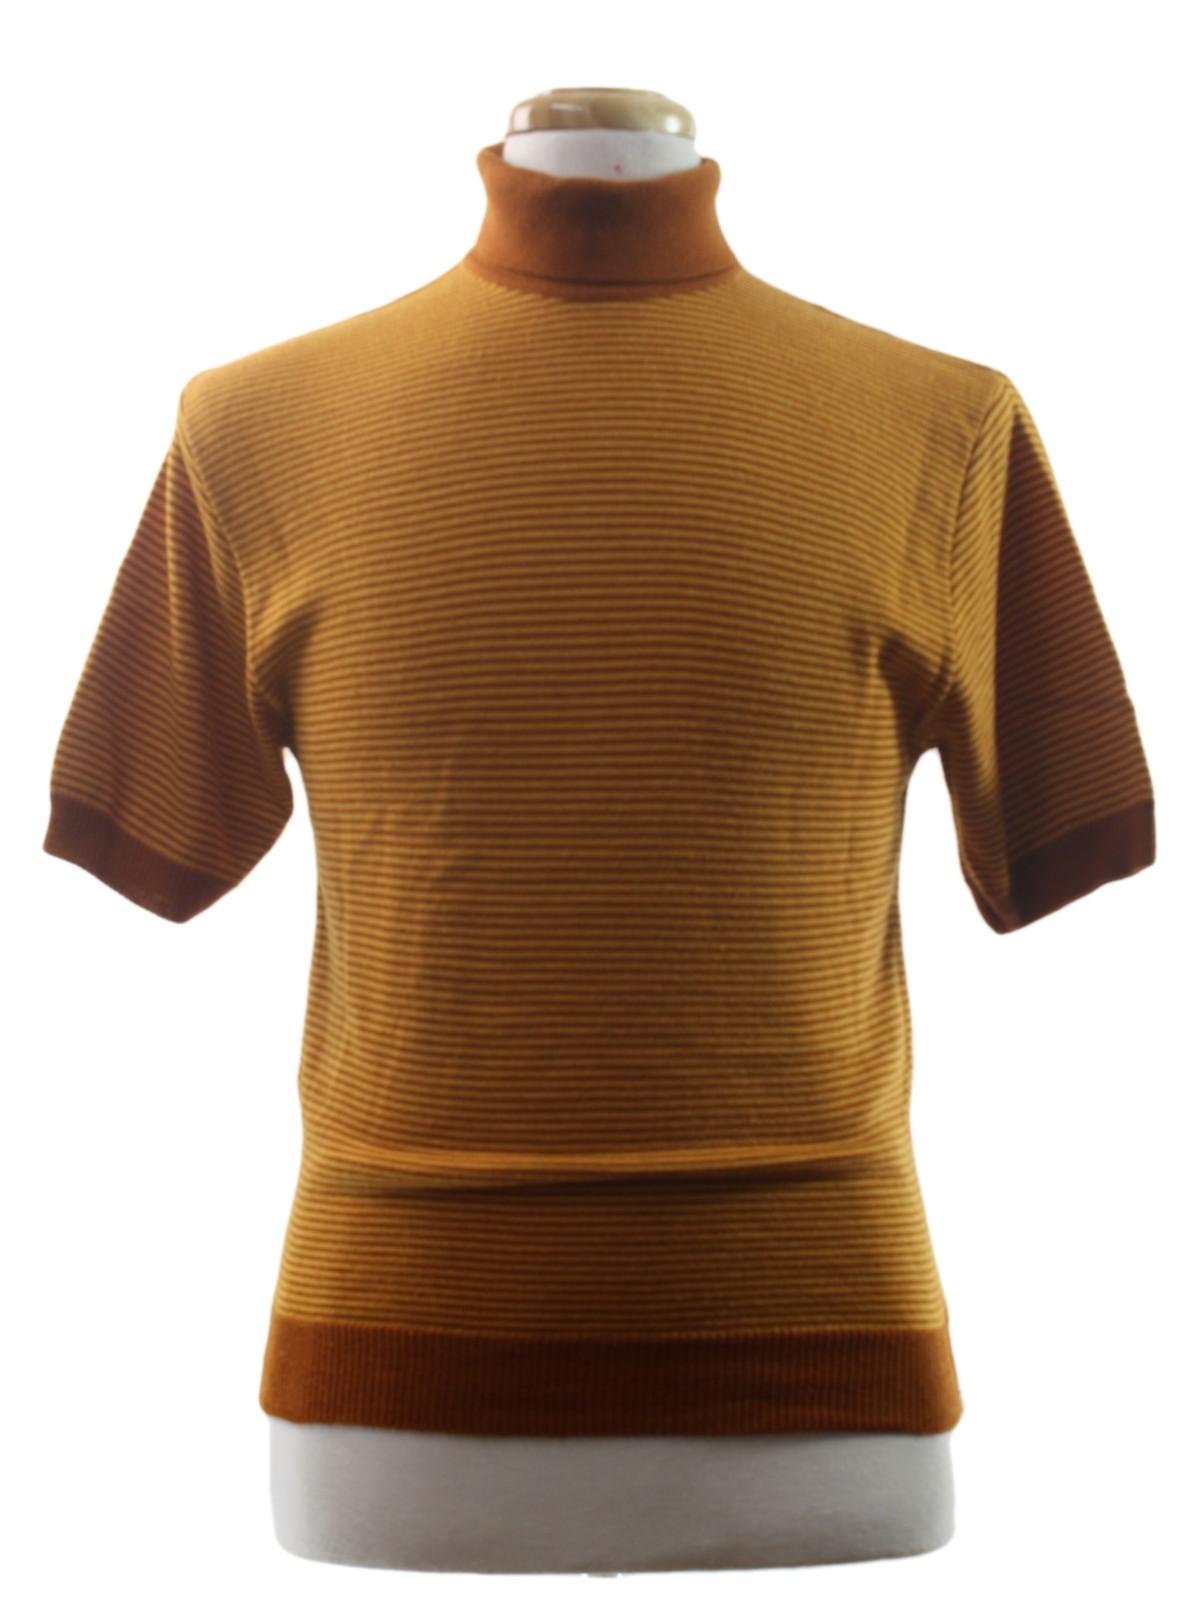 Mens Turtleneck Shirt